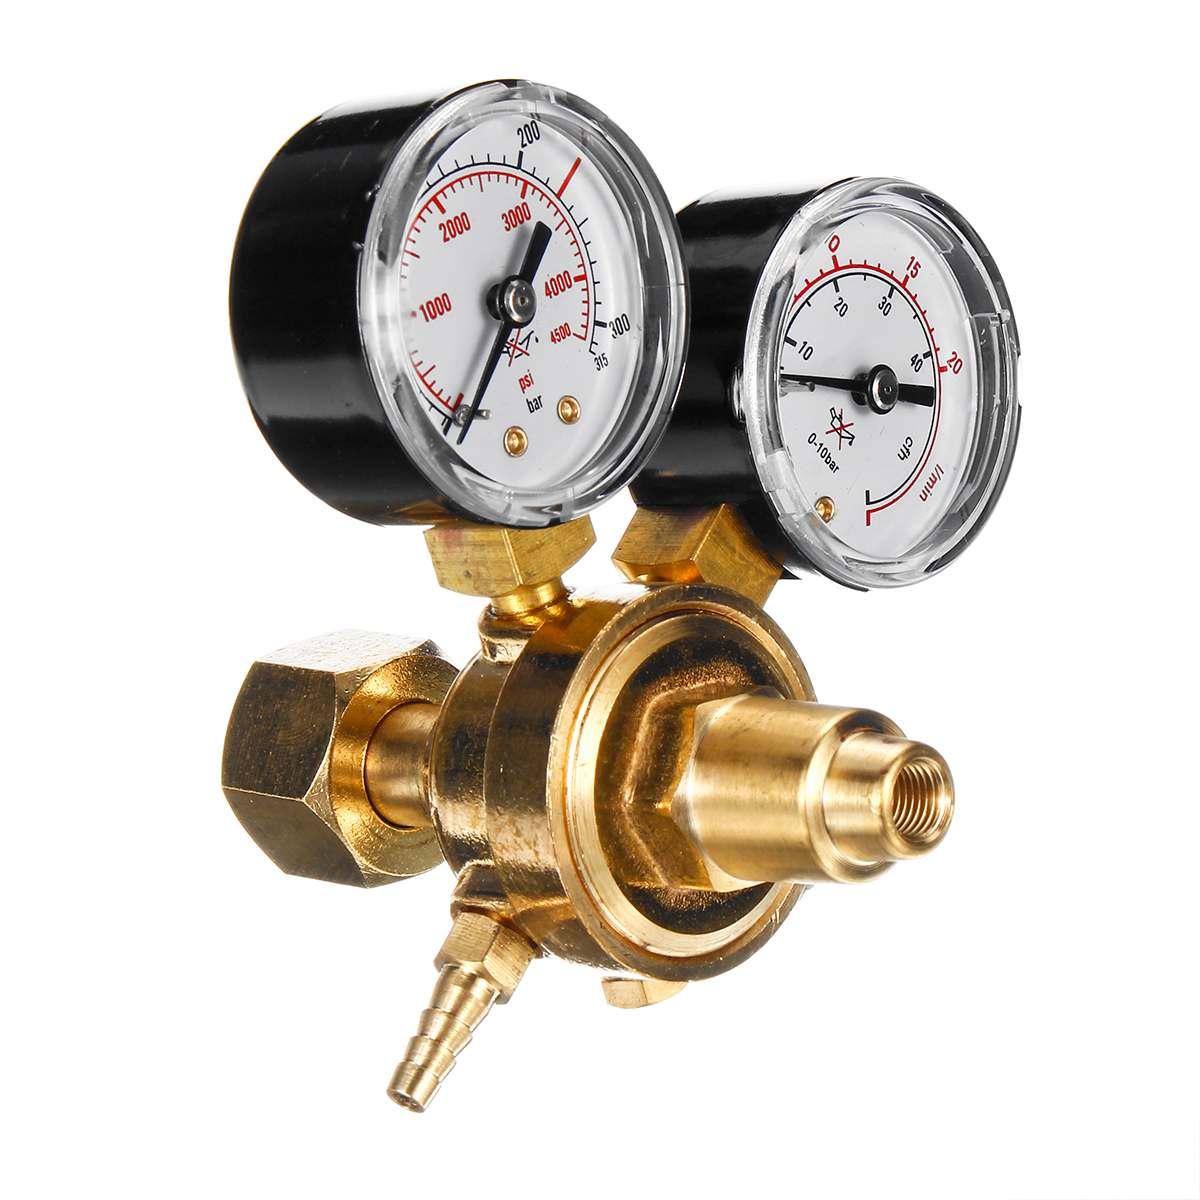 Dual Gauge Argon CO2 Gauges Pressure Reducer Mig Flow Meter Gas Control Valve Welding Regulator Argon Regulator Pressure Reducer